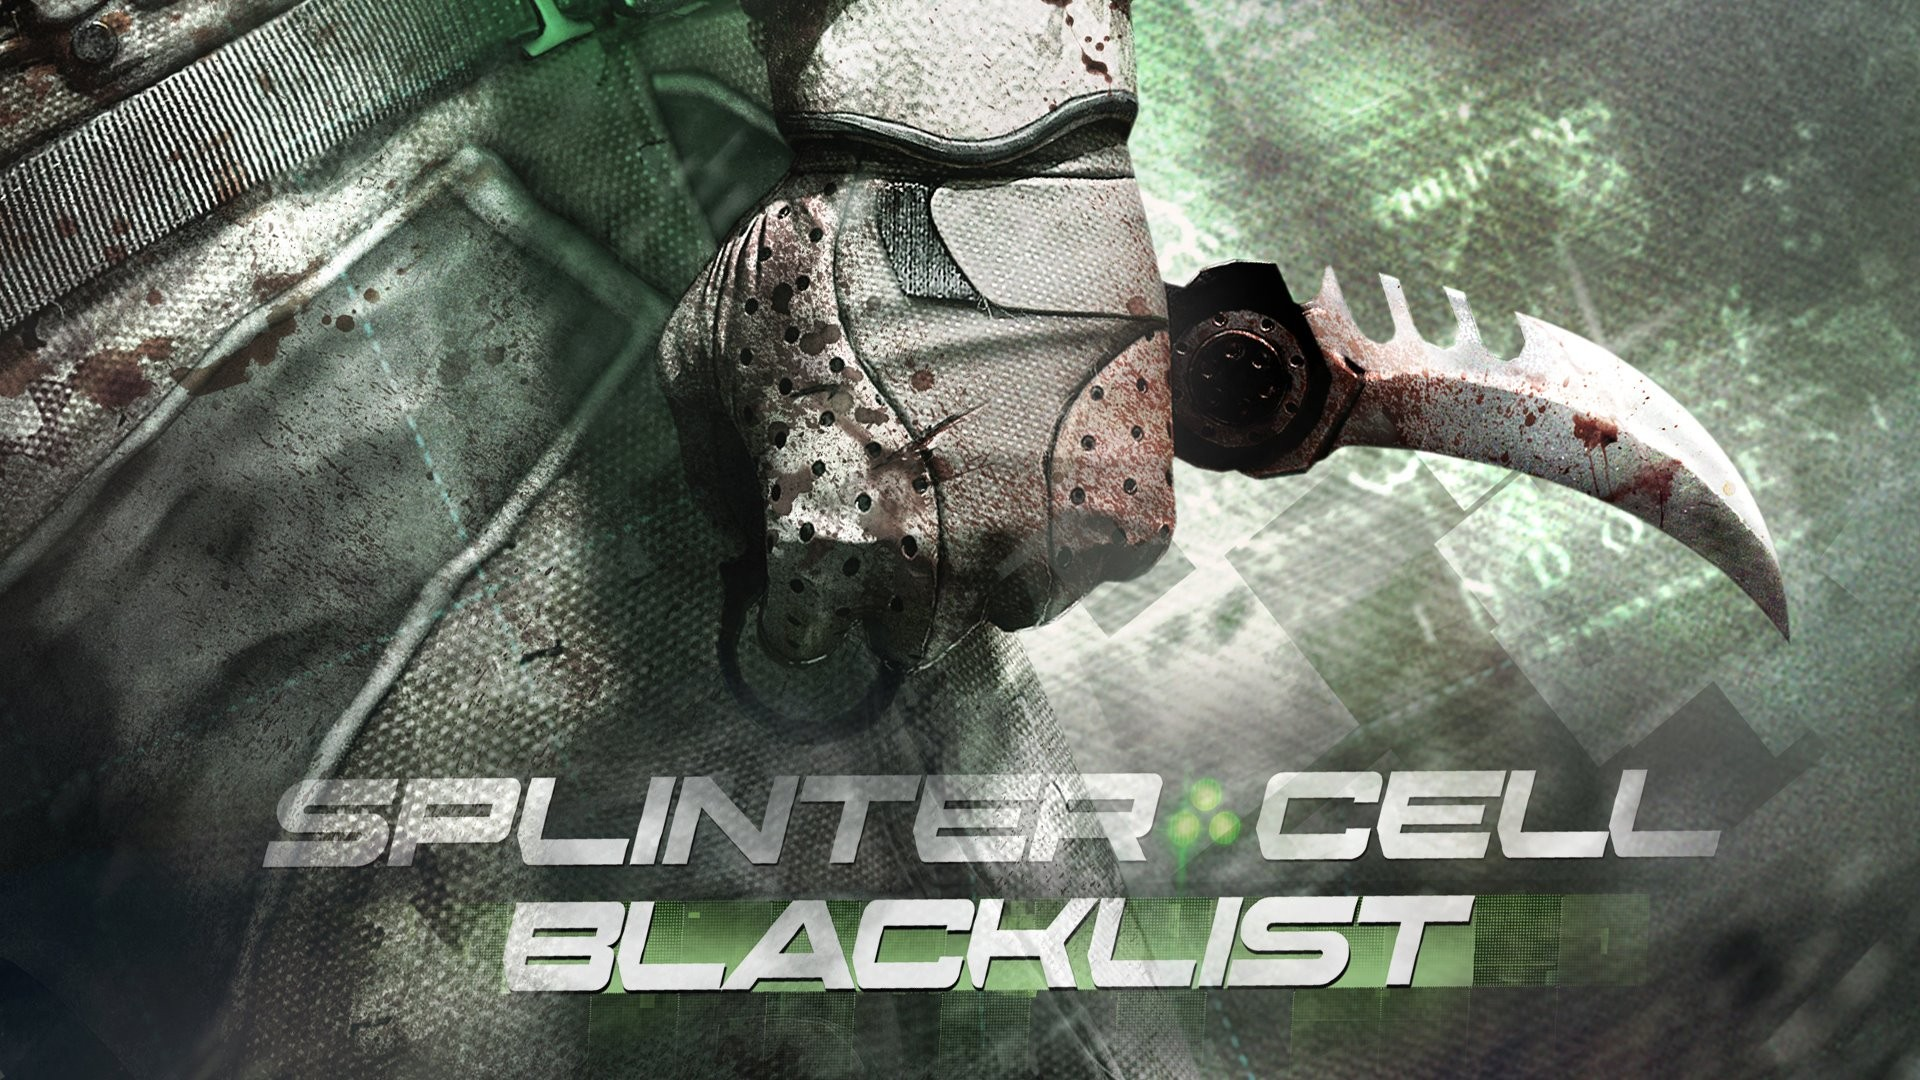 Tom Clancys Splinter Cell Blacklist Full HD Wallpaper and